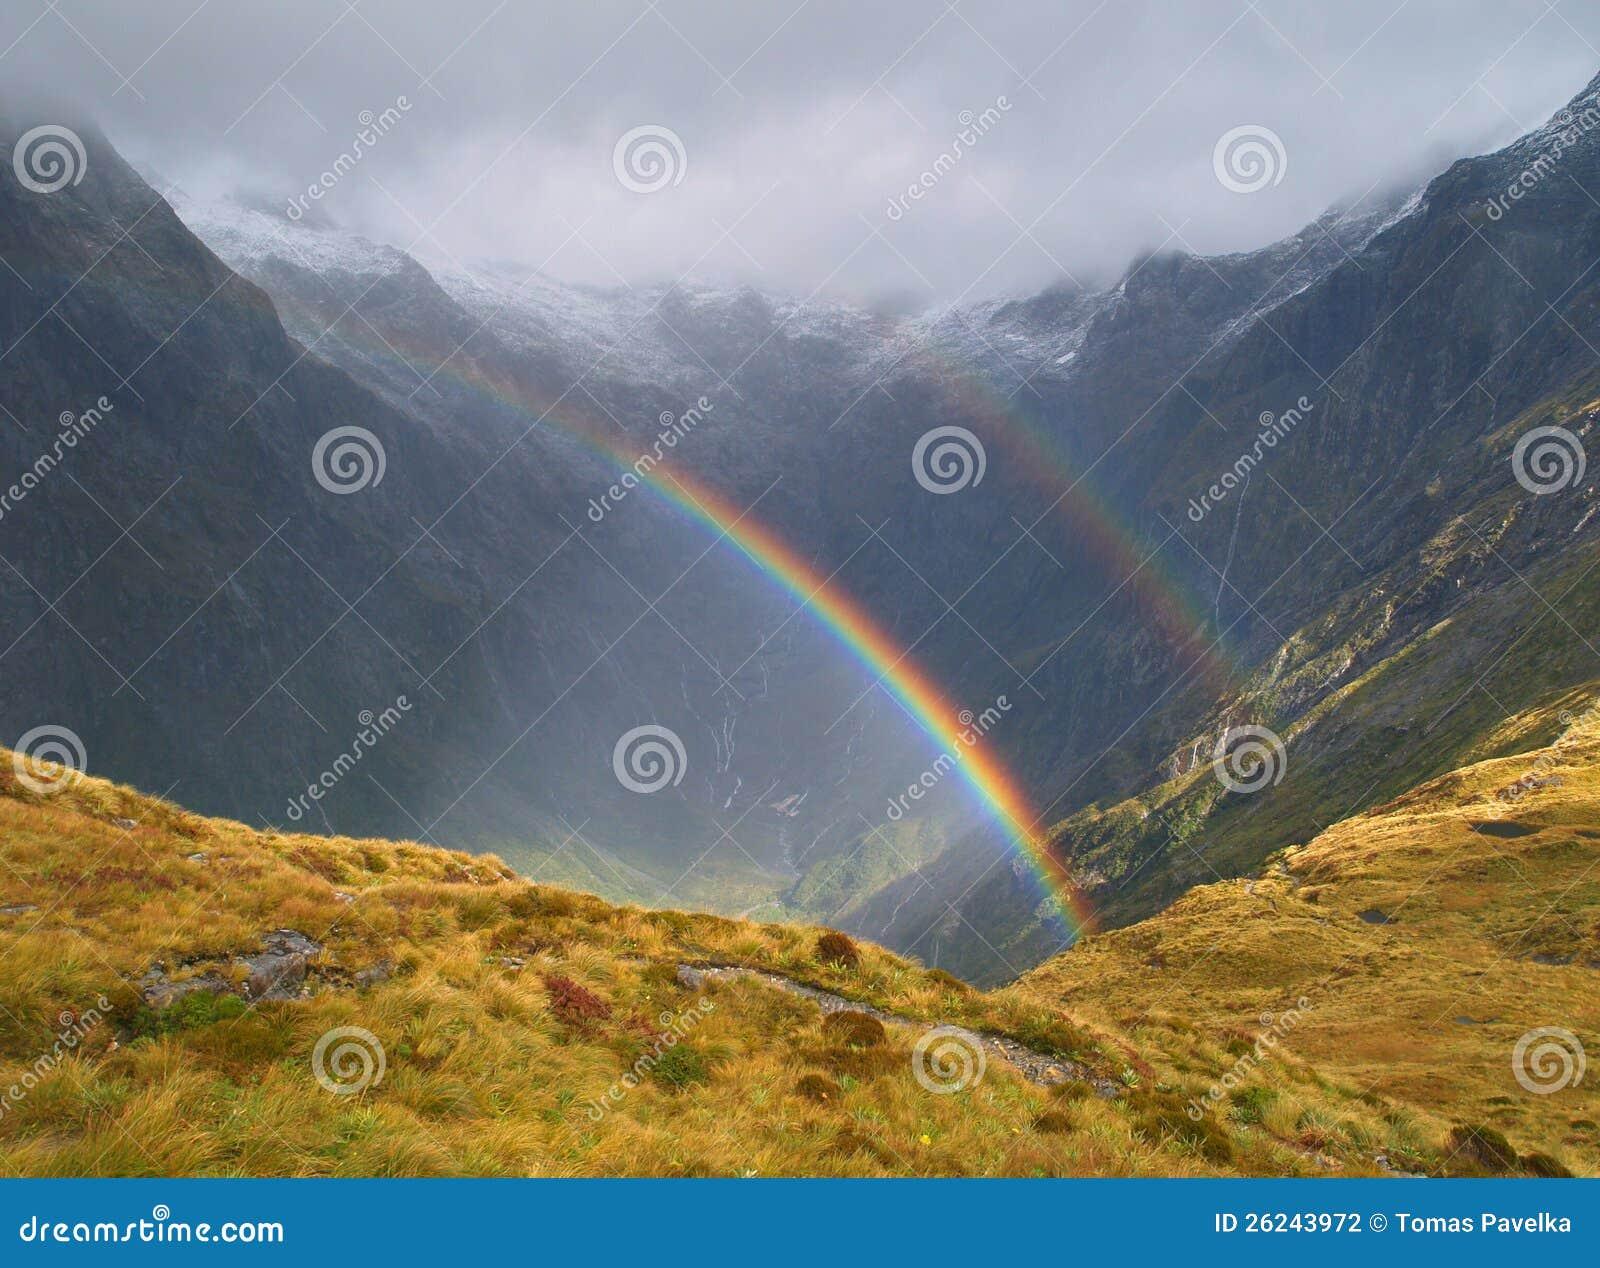 part of rainbow stock photography image 26243972